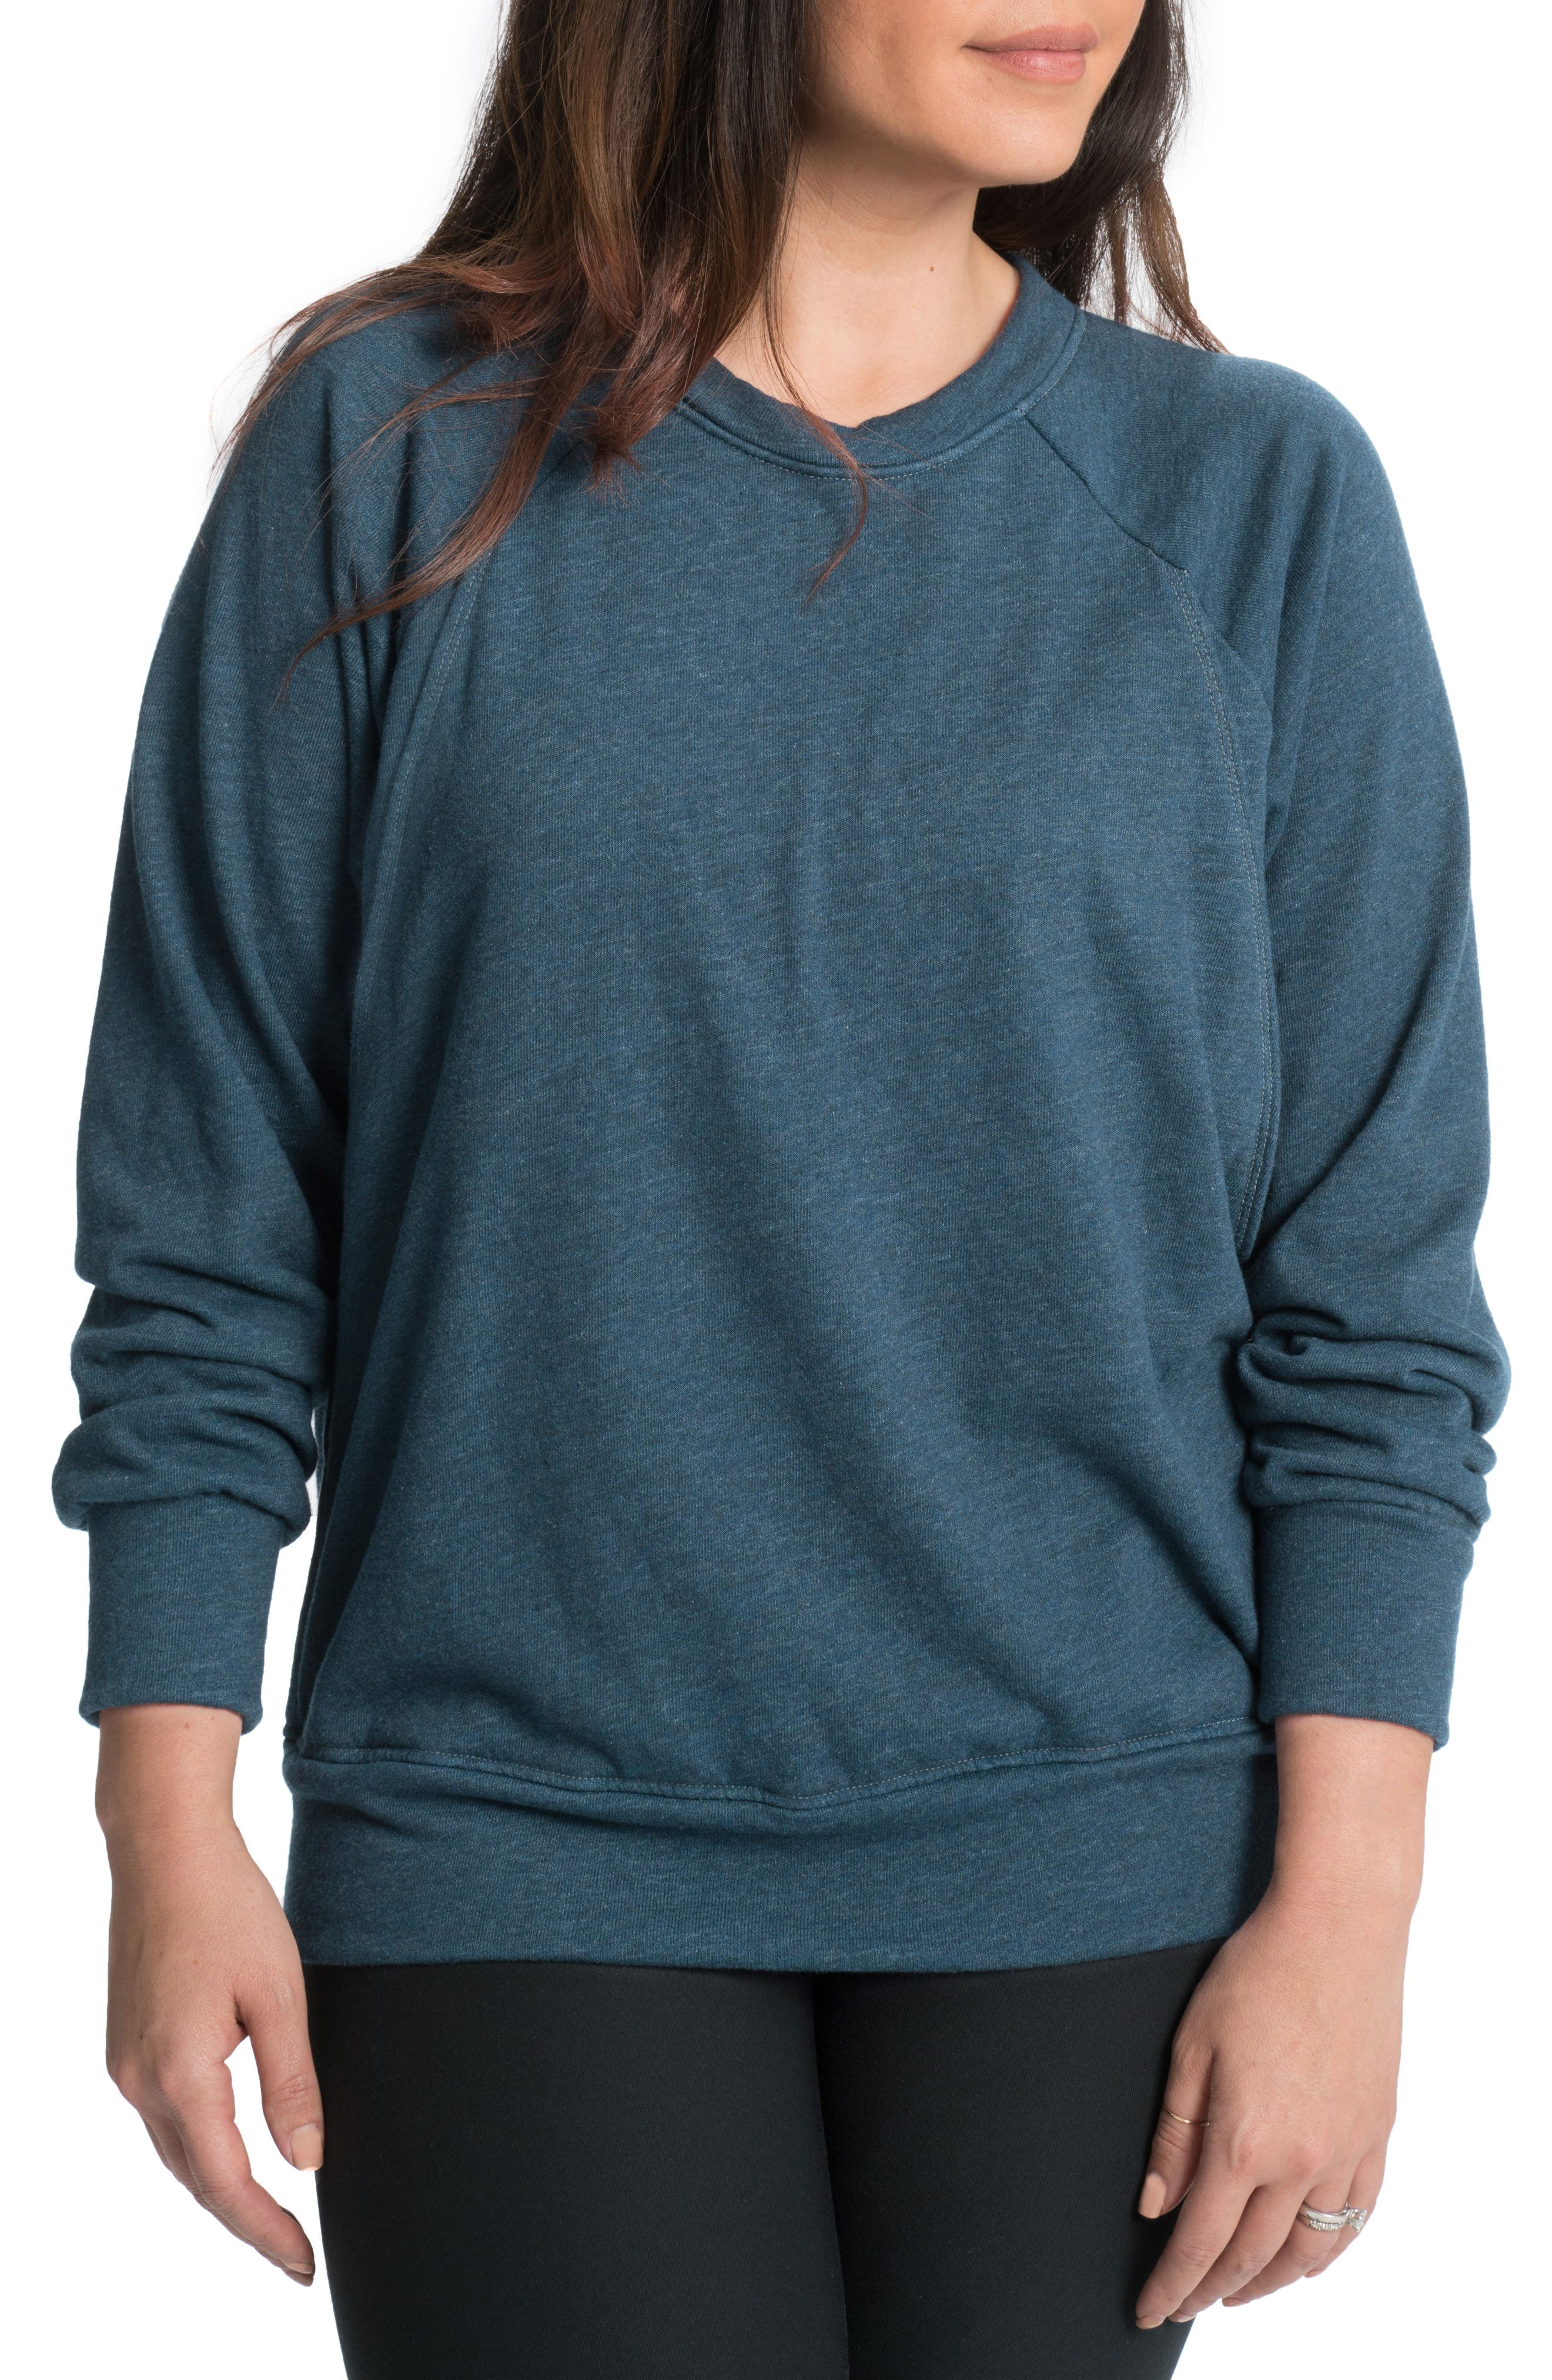 BUN MATERNITY Relaxed Daily Maternity/Nursing Sweatshirt, Main, color, 001